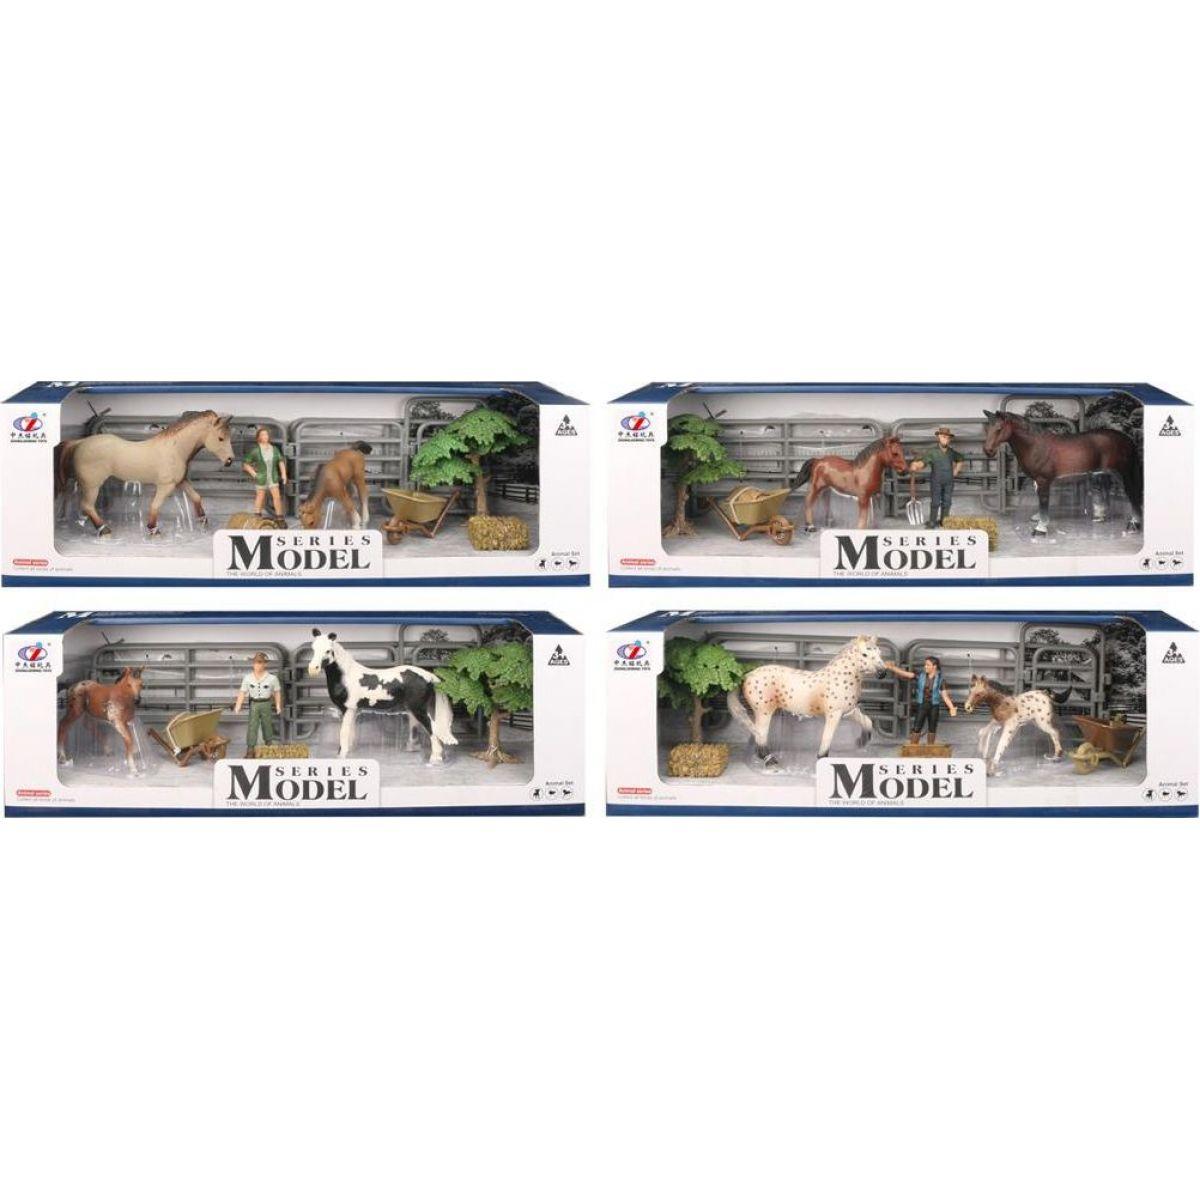 Series Model Svet zvierat sada 2 s figúrkou, koňom a žriebätkom